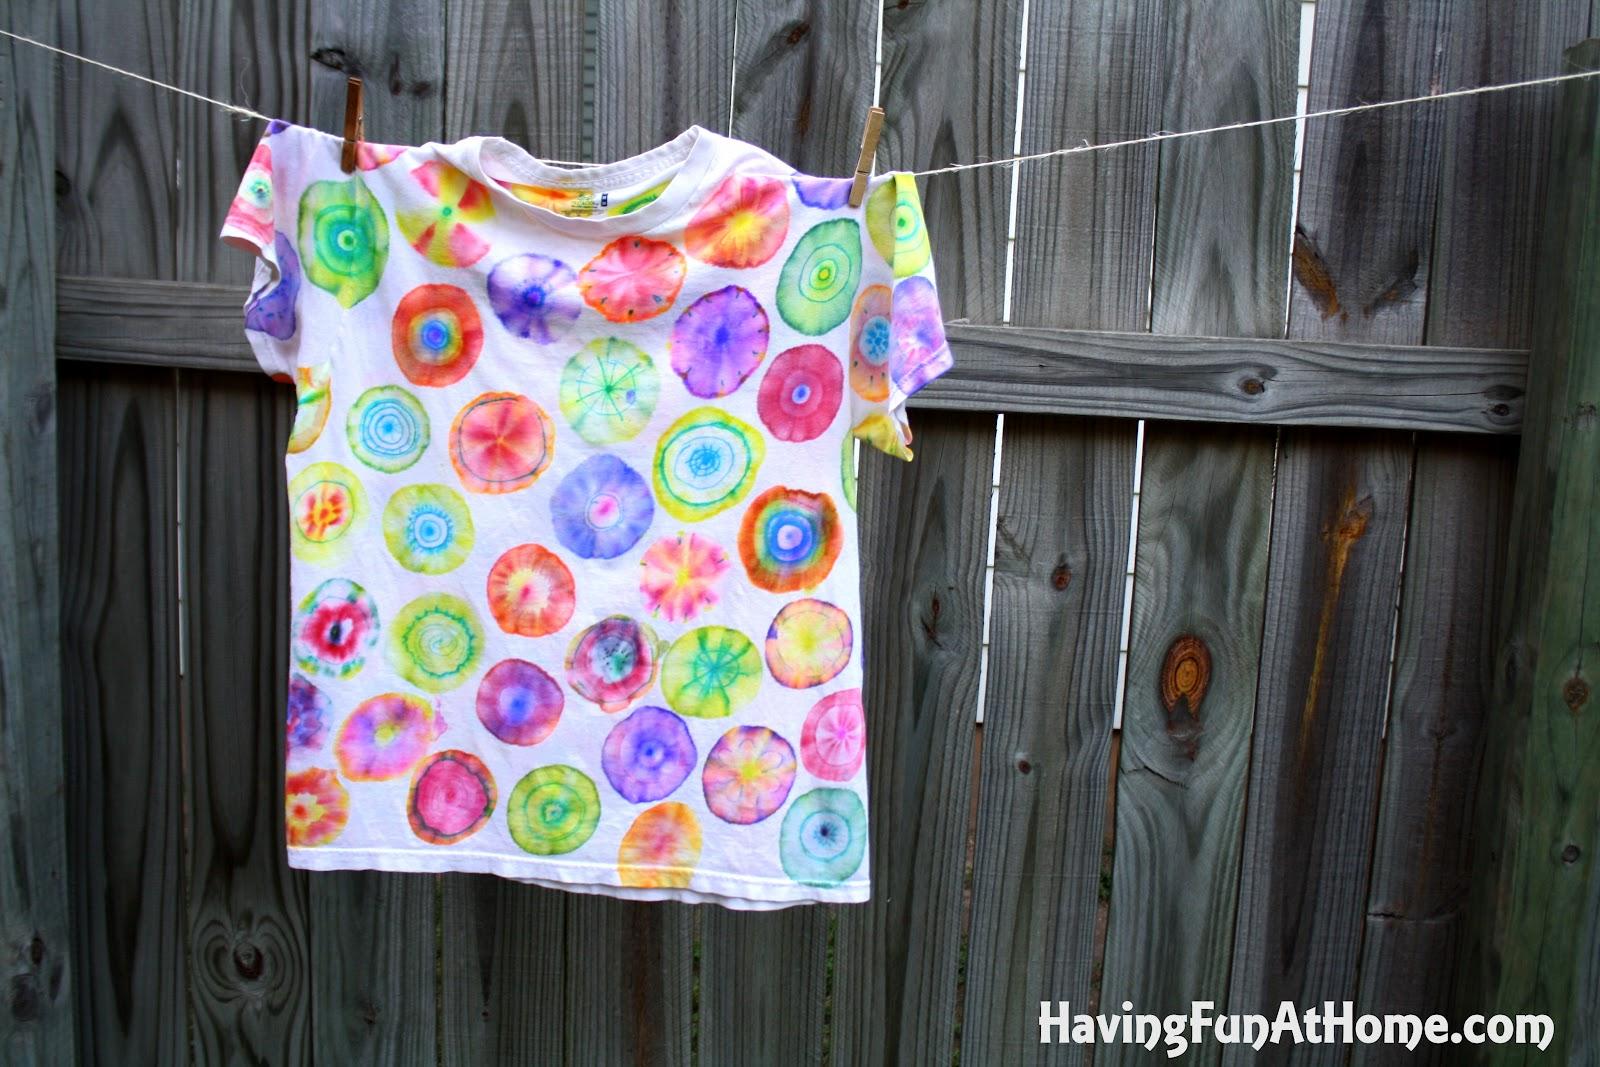 ded5930b8c4e94 Having Fun at Home  Sharpie Tie Dye Method  10 Tips